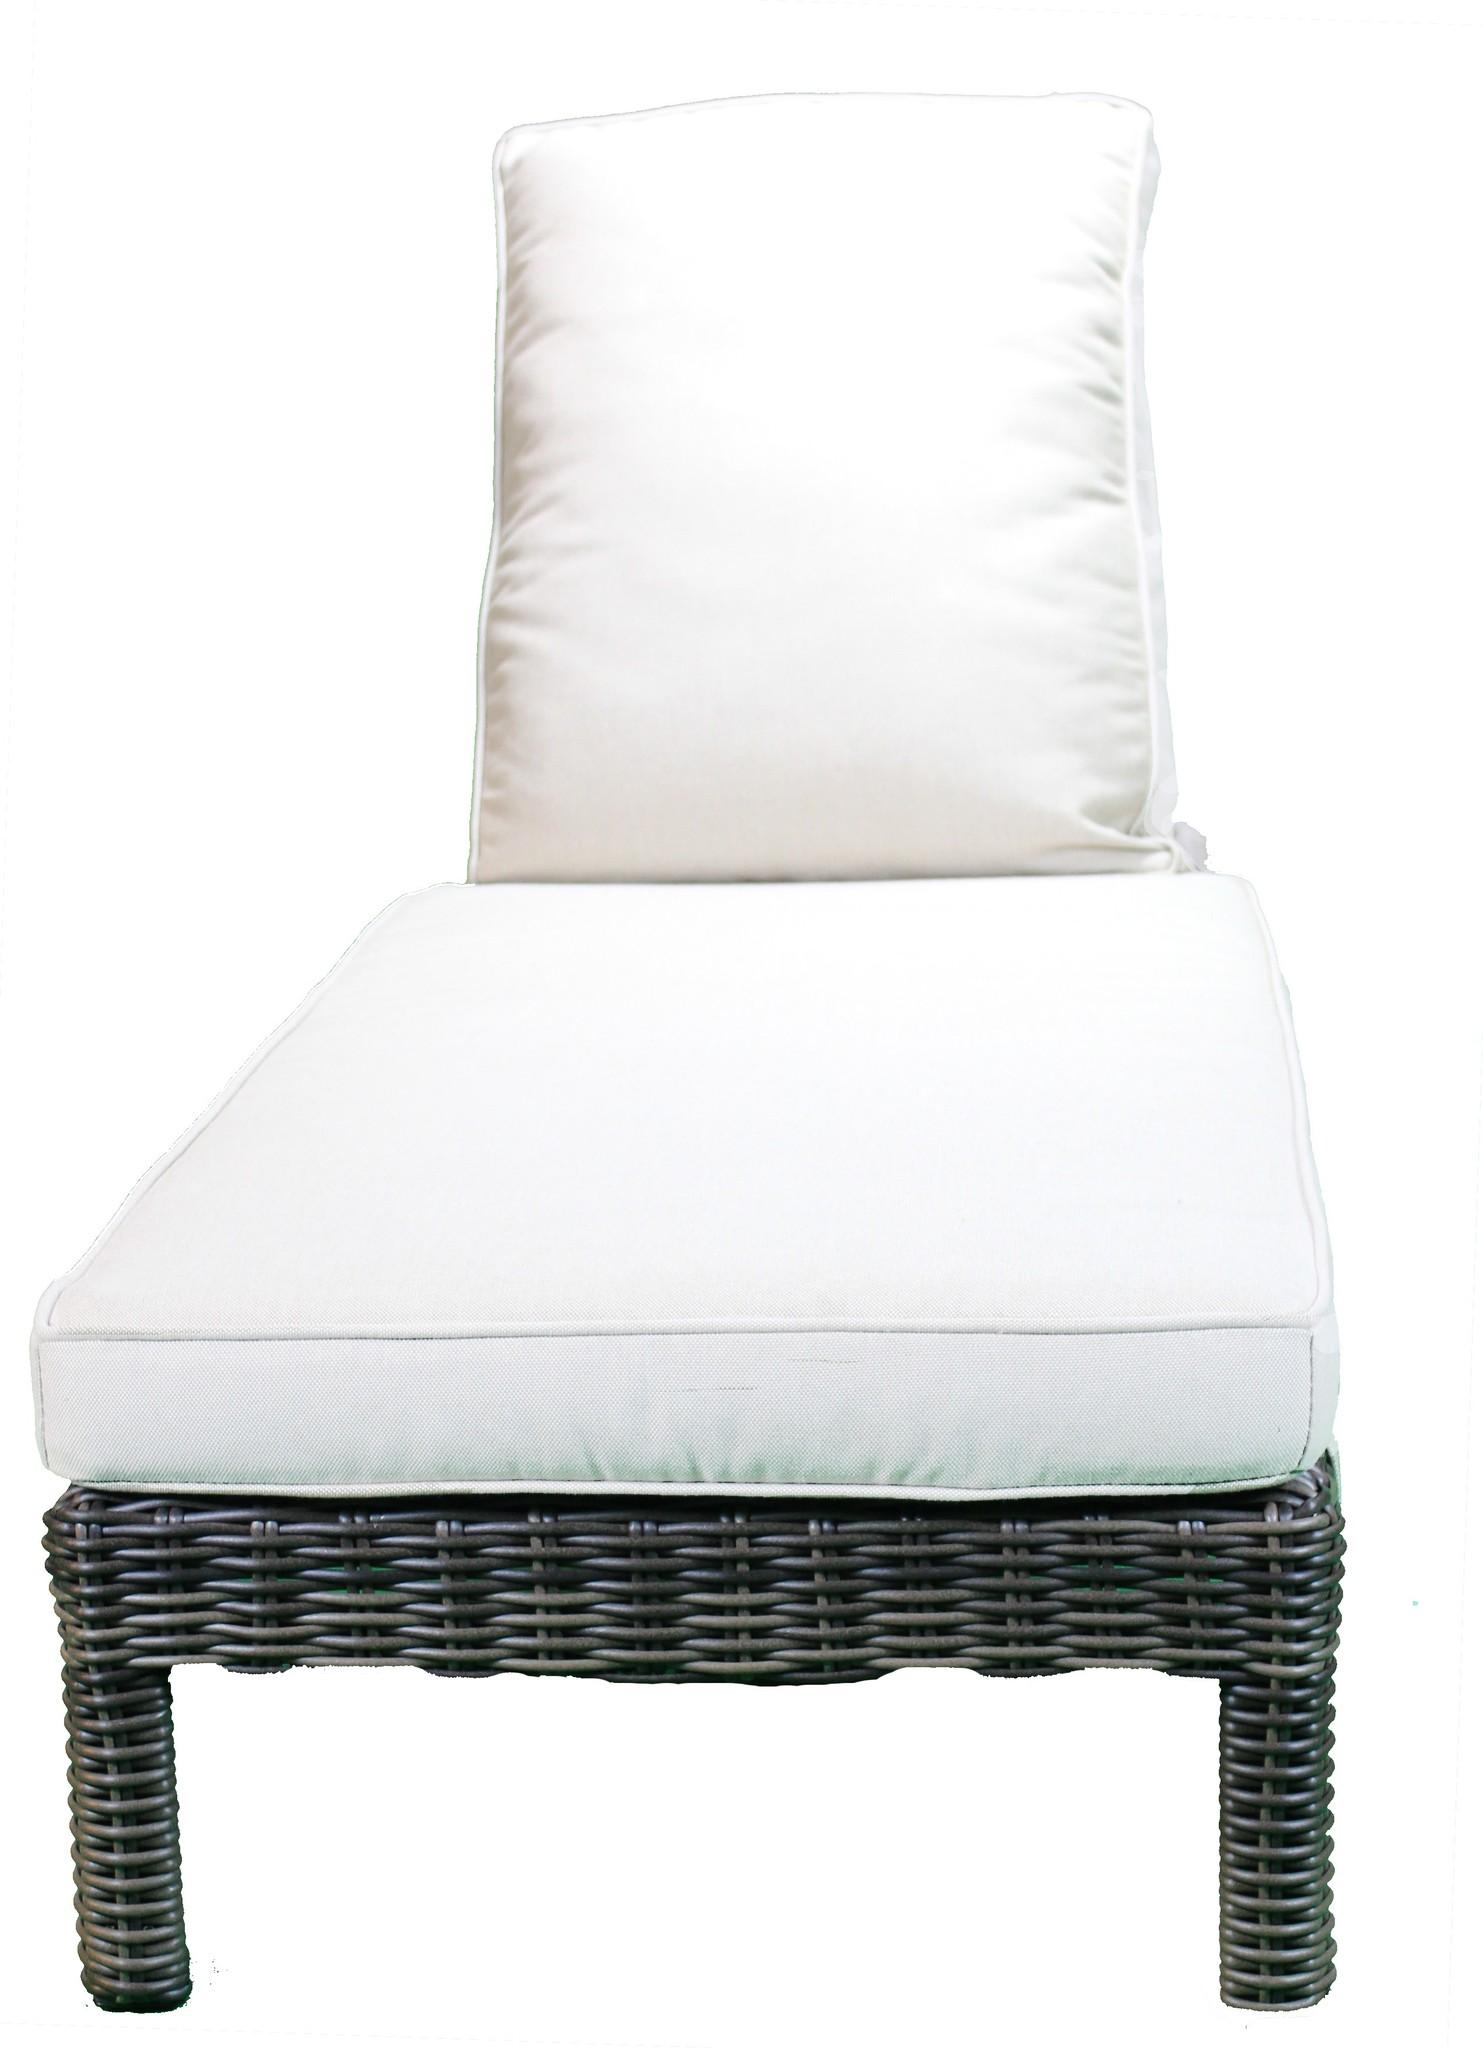 Patio Furniture Chaise Cushions: Catalina Chaise